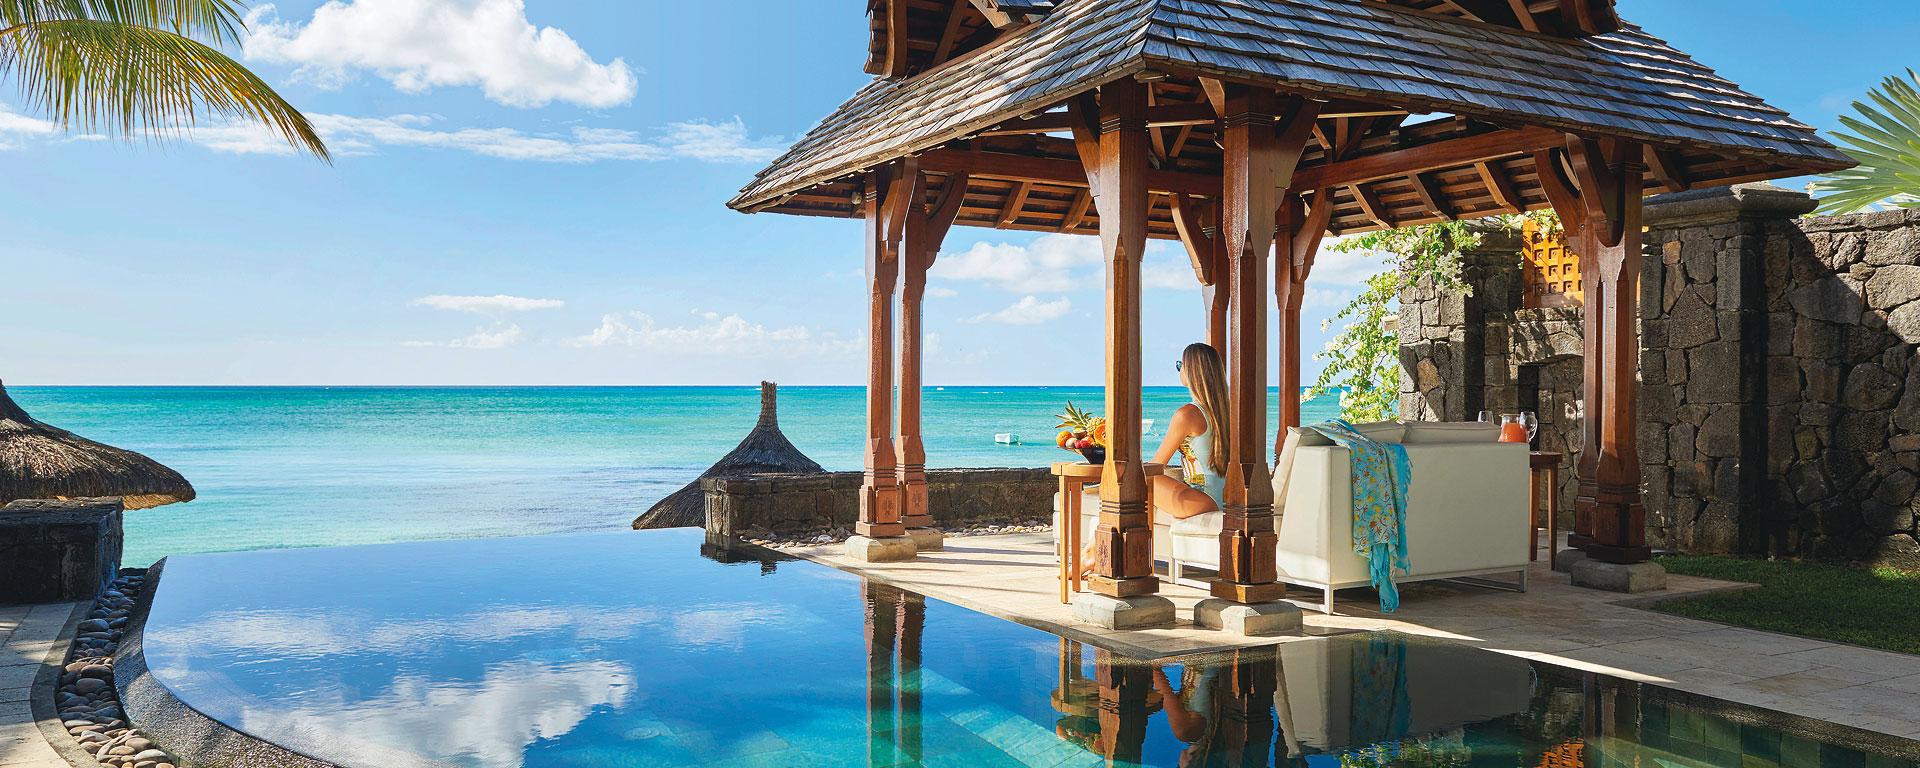 Royal Palm Beachcomber Luxury 5* Luxury avec Jet tours